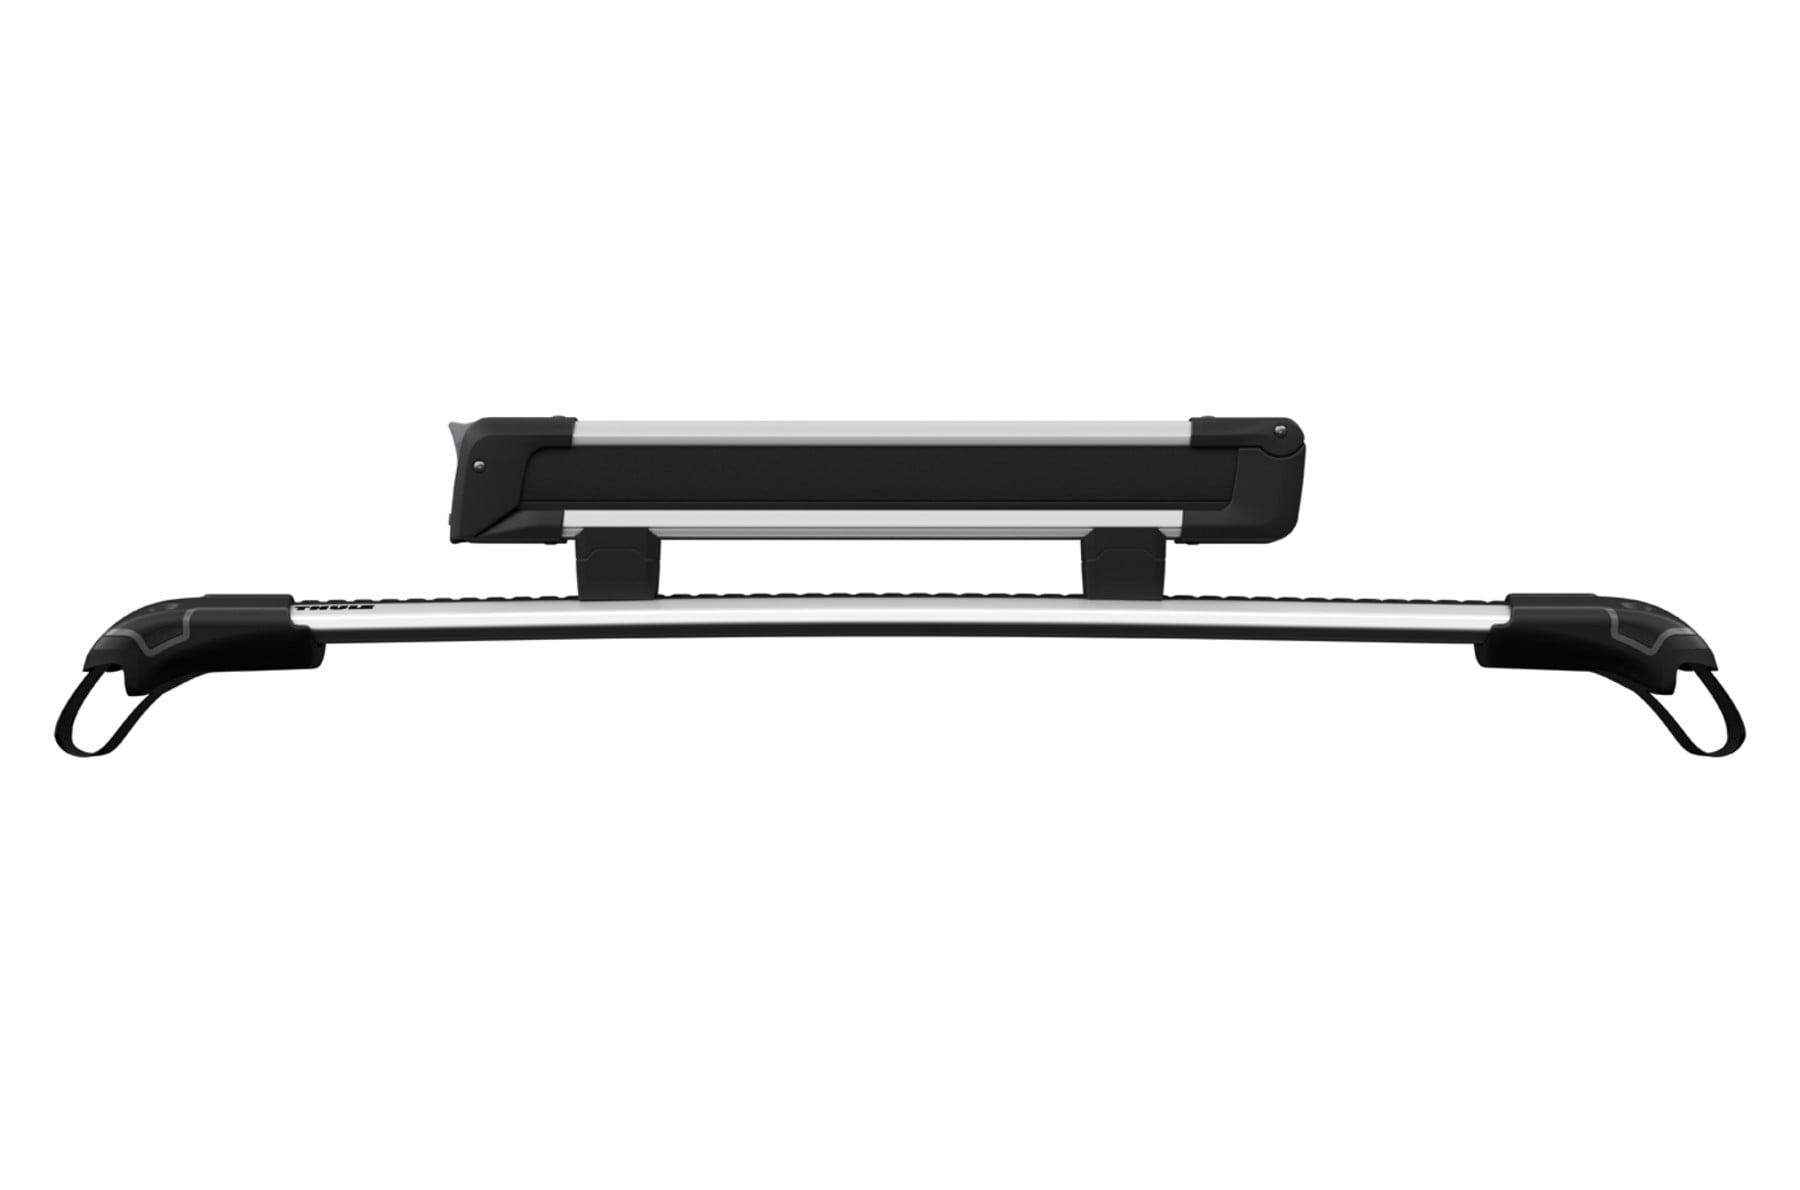 Suport schiuri Thule SnowPack 7326 cu prindere pe bare transversale din aluminiu cu profil T 4